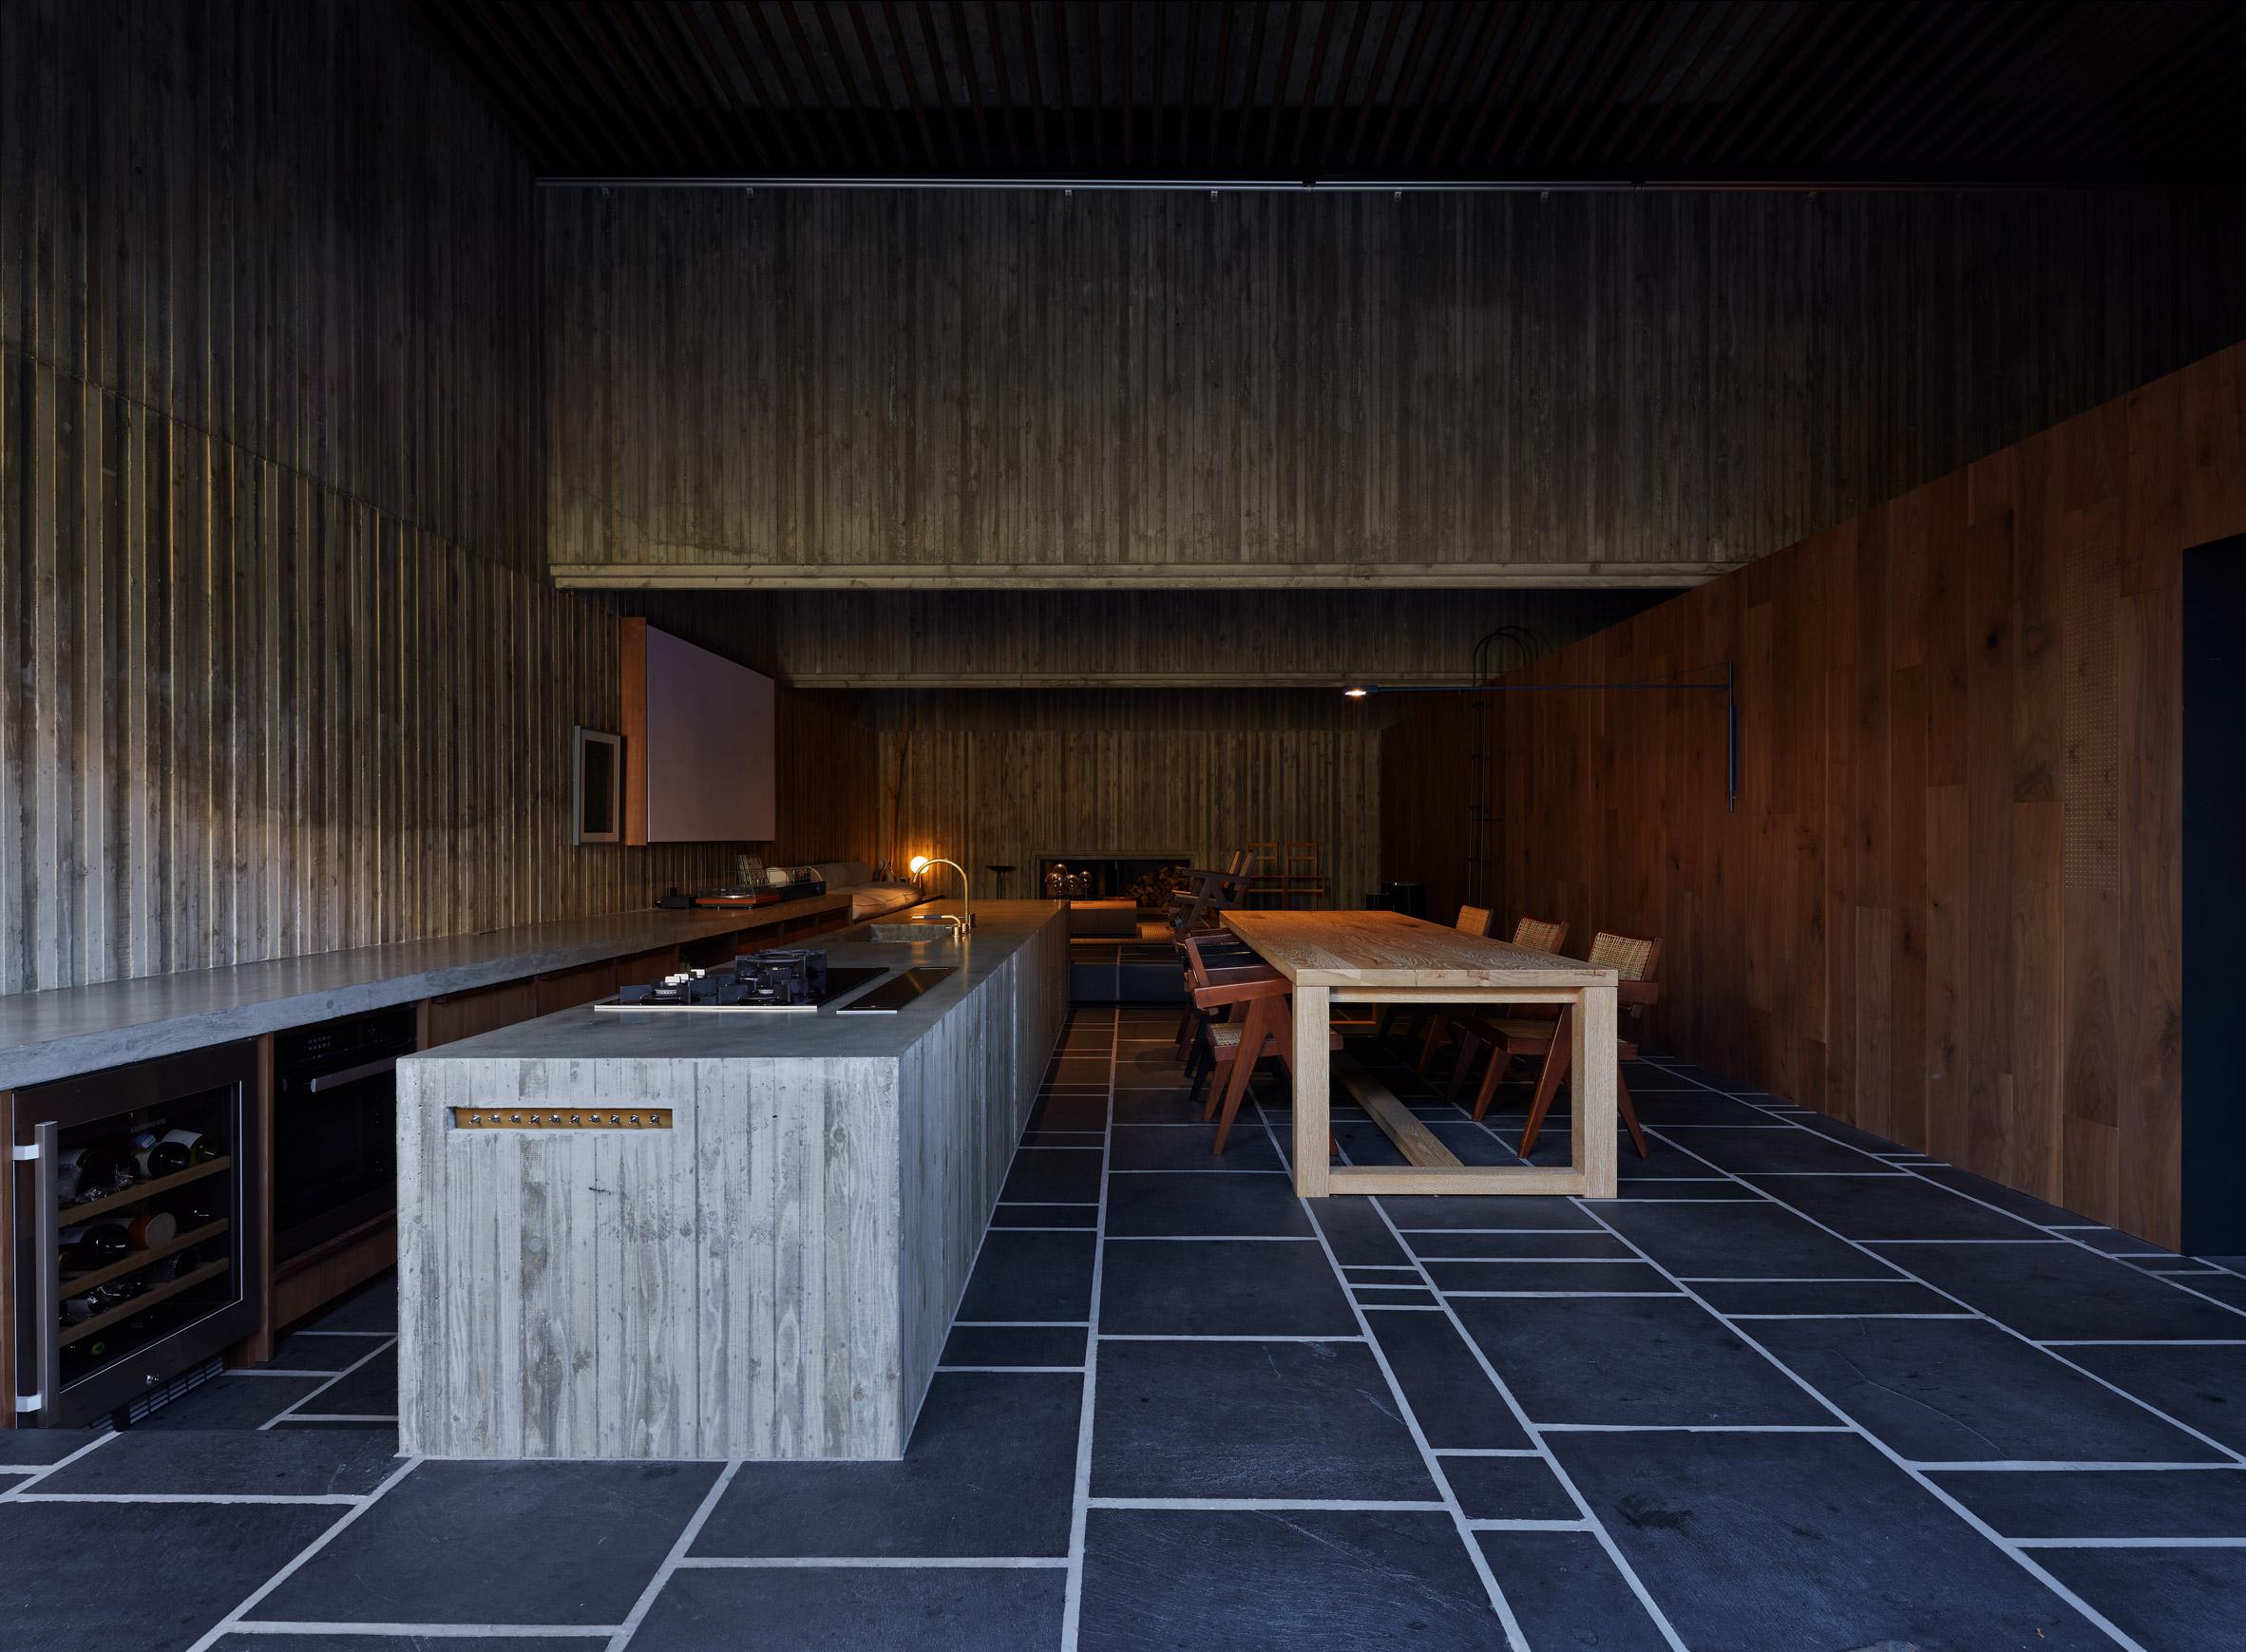 The dark concrete interiors of Japanese kitchen